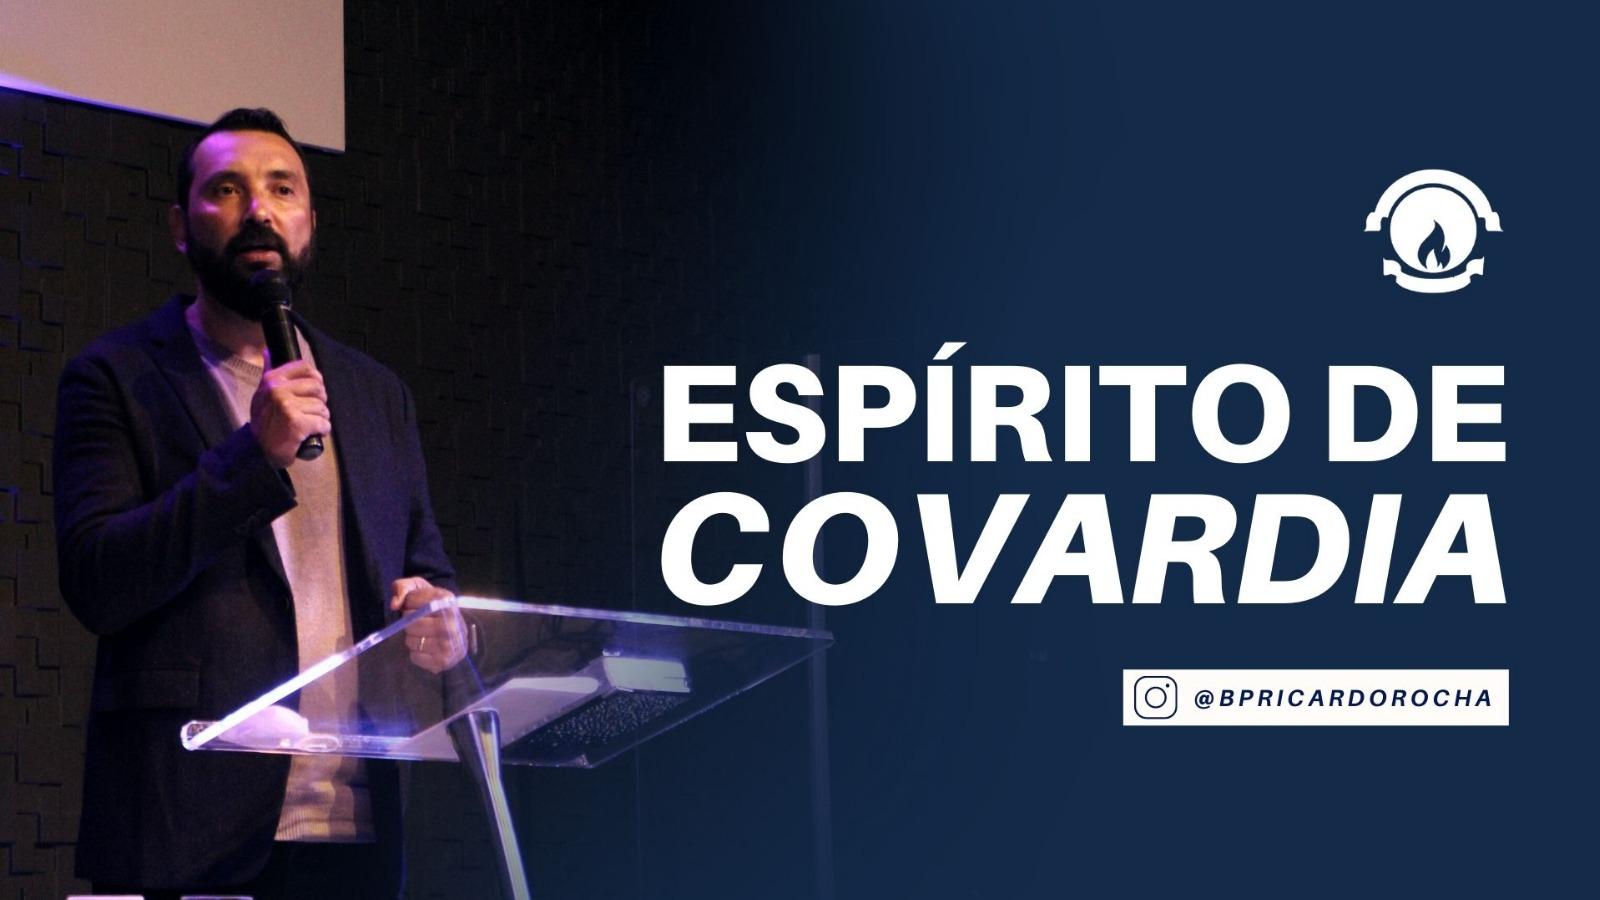 ESPÍRITO DE COVARDIA